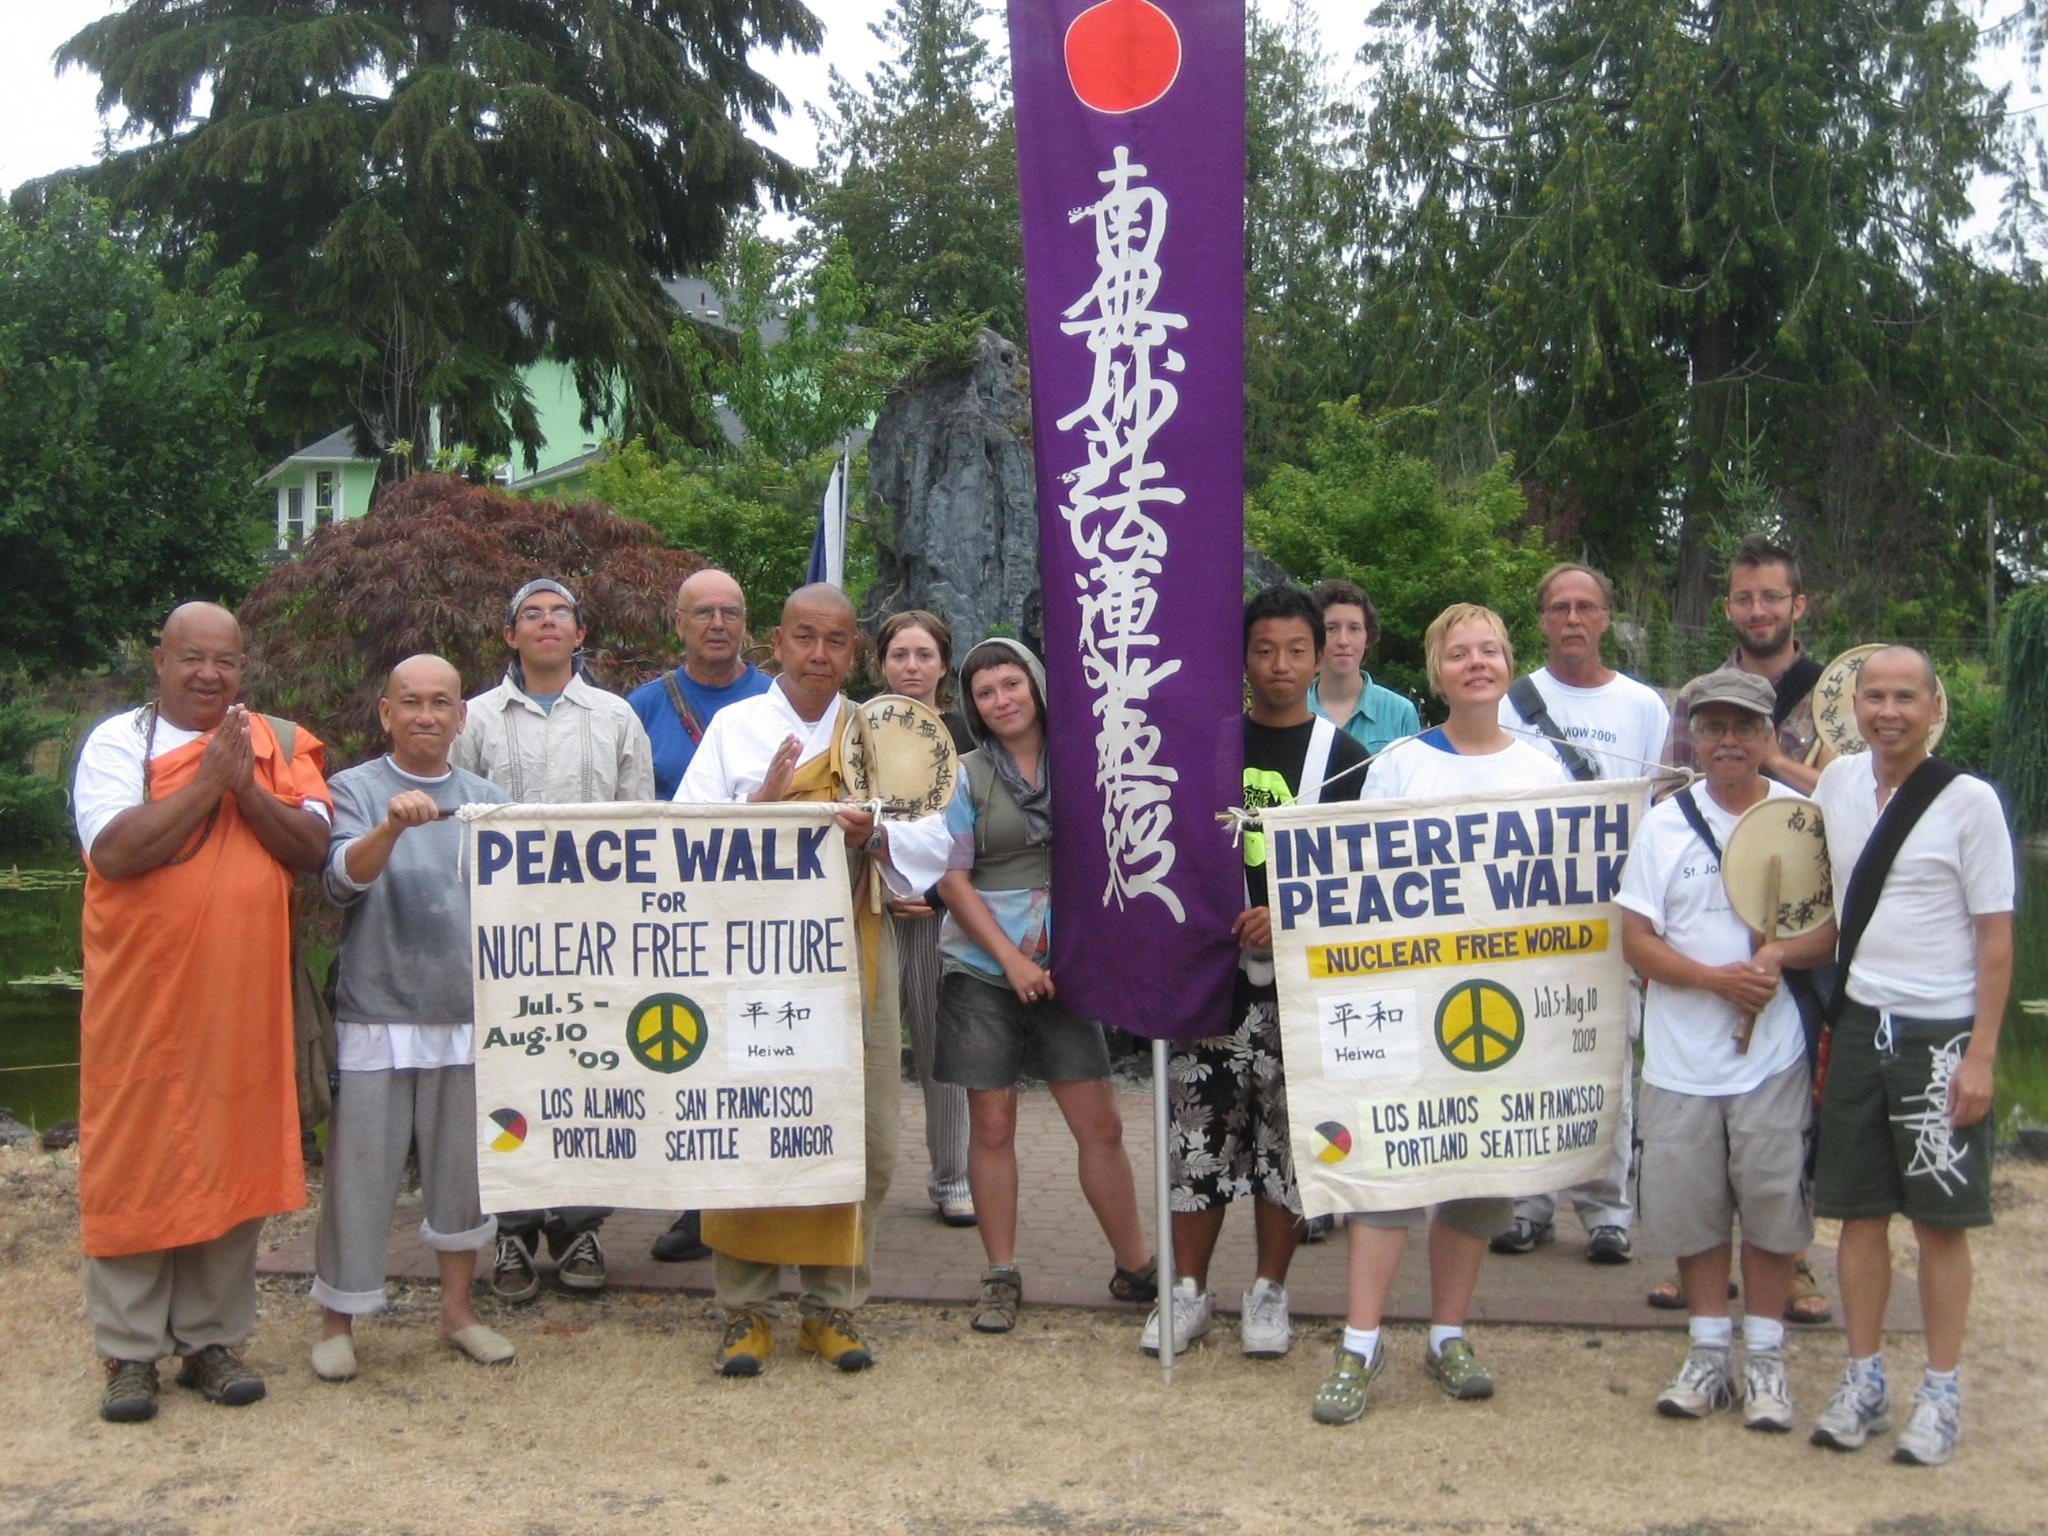 PeaceWalker at Thiền Viện Nhẫn Hòa, Olympia, WA